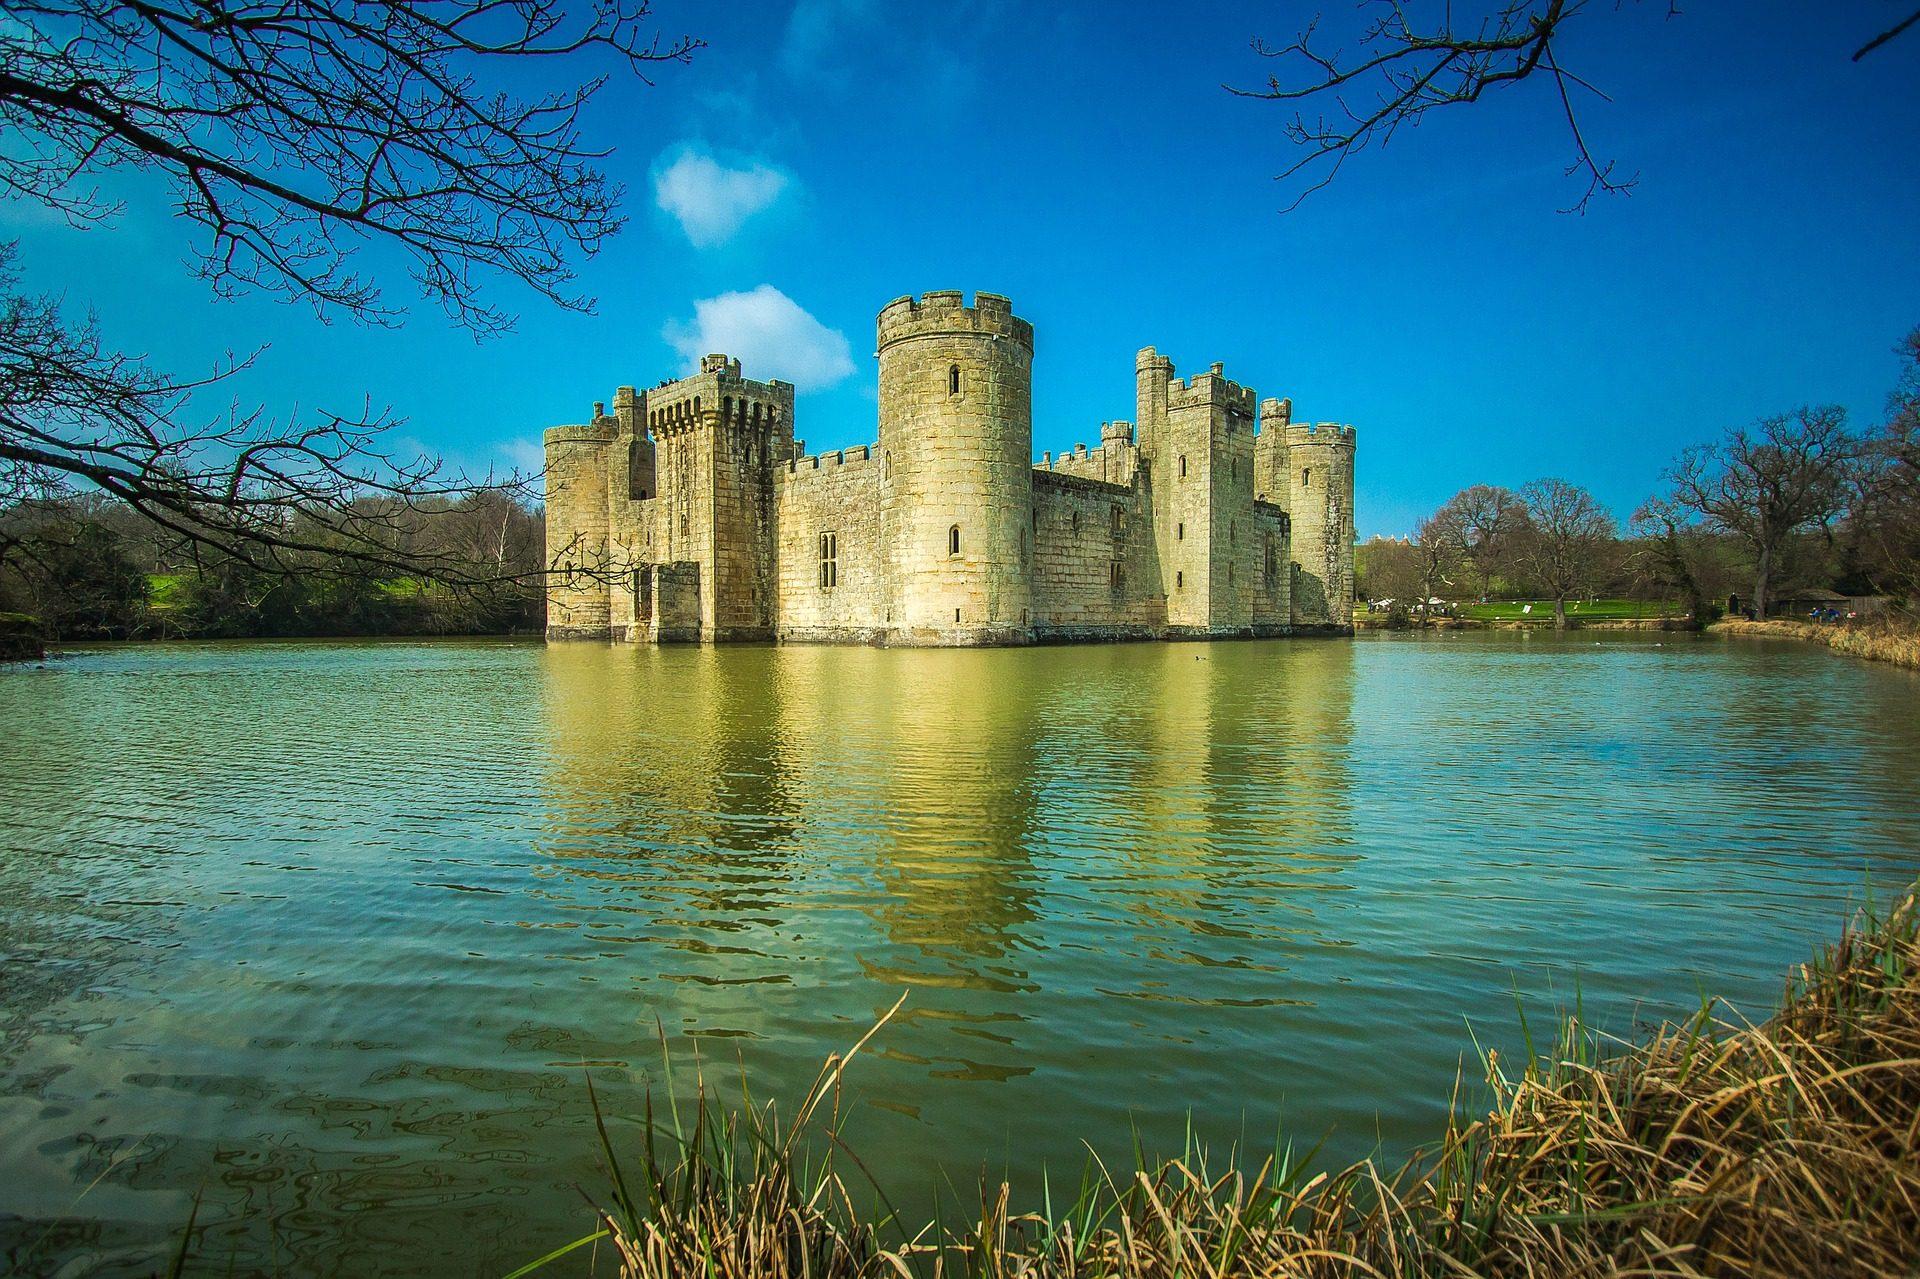 Château, Forteresse, Lake, Bodiam, L'Angleterre - Fonds d'écran HD - Professor-falken.com